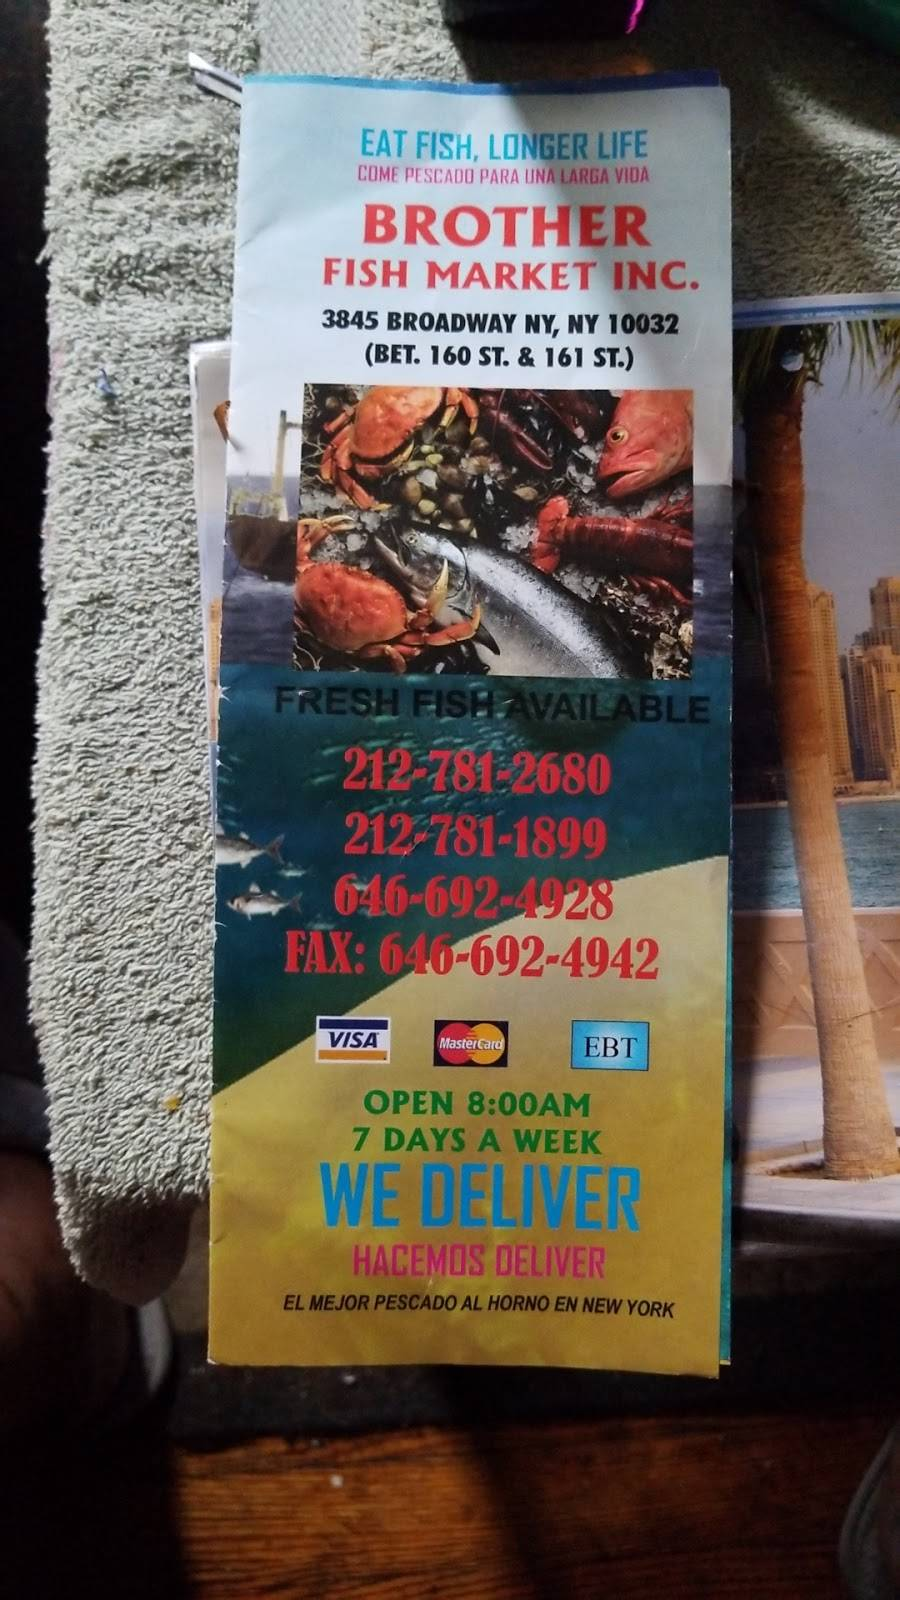 Brother Fish Market | restaurant | 3845 Broadway, New York, NY 10032, USA | 2127811899 OR +1 212-781-1899